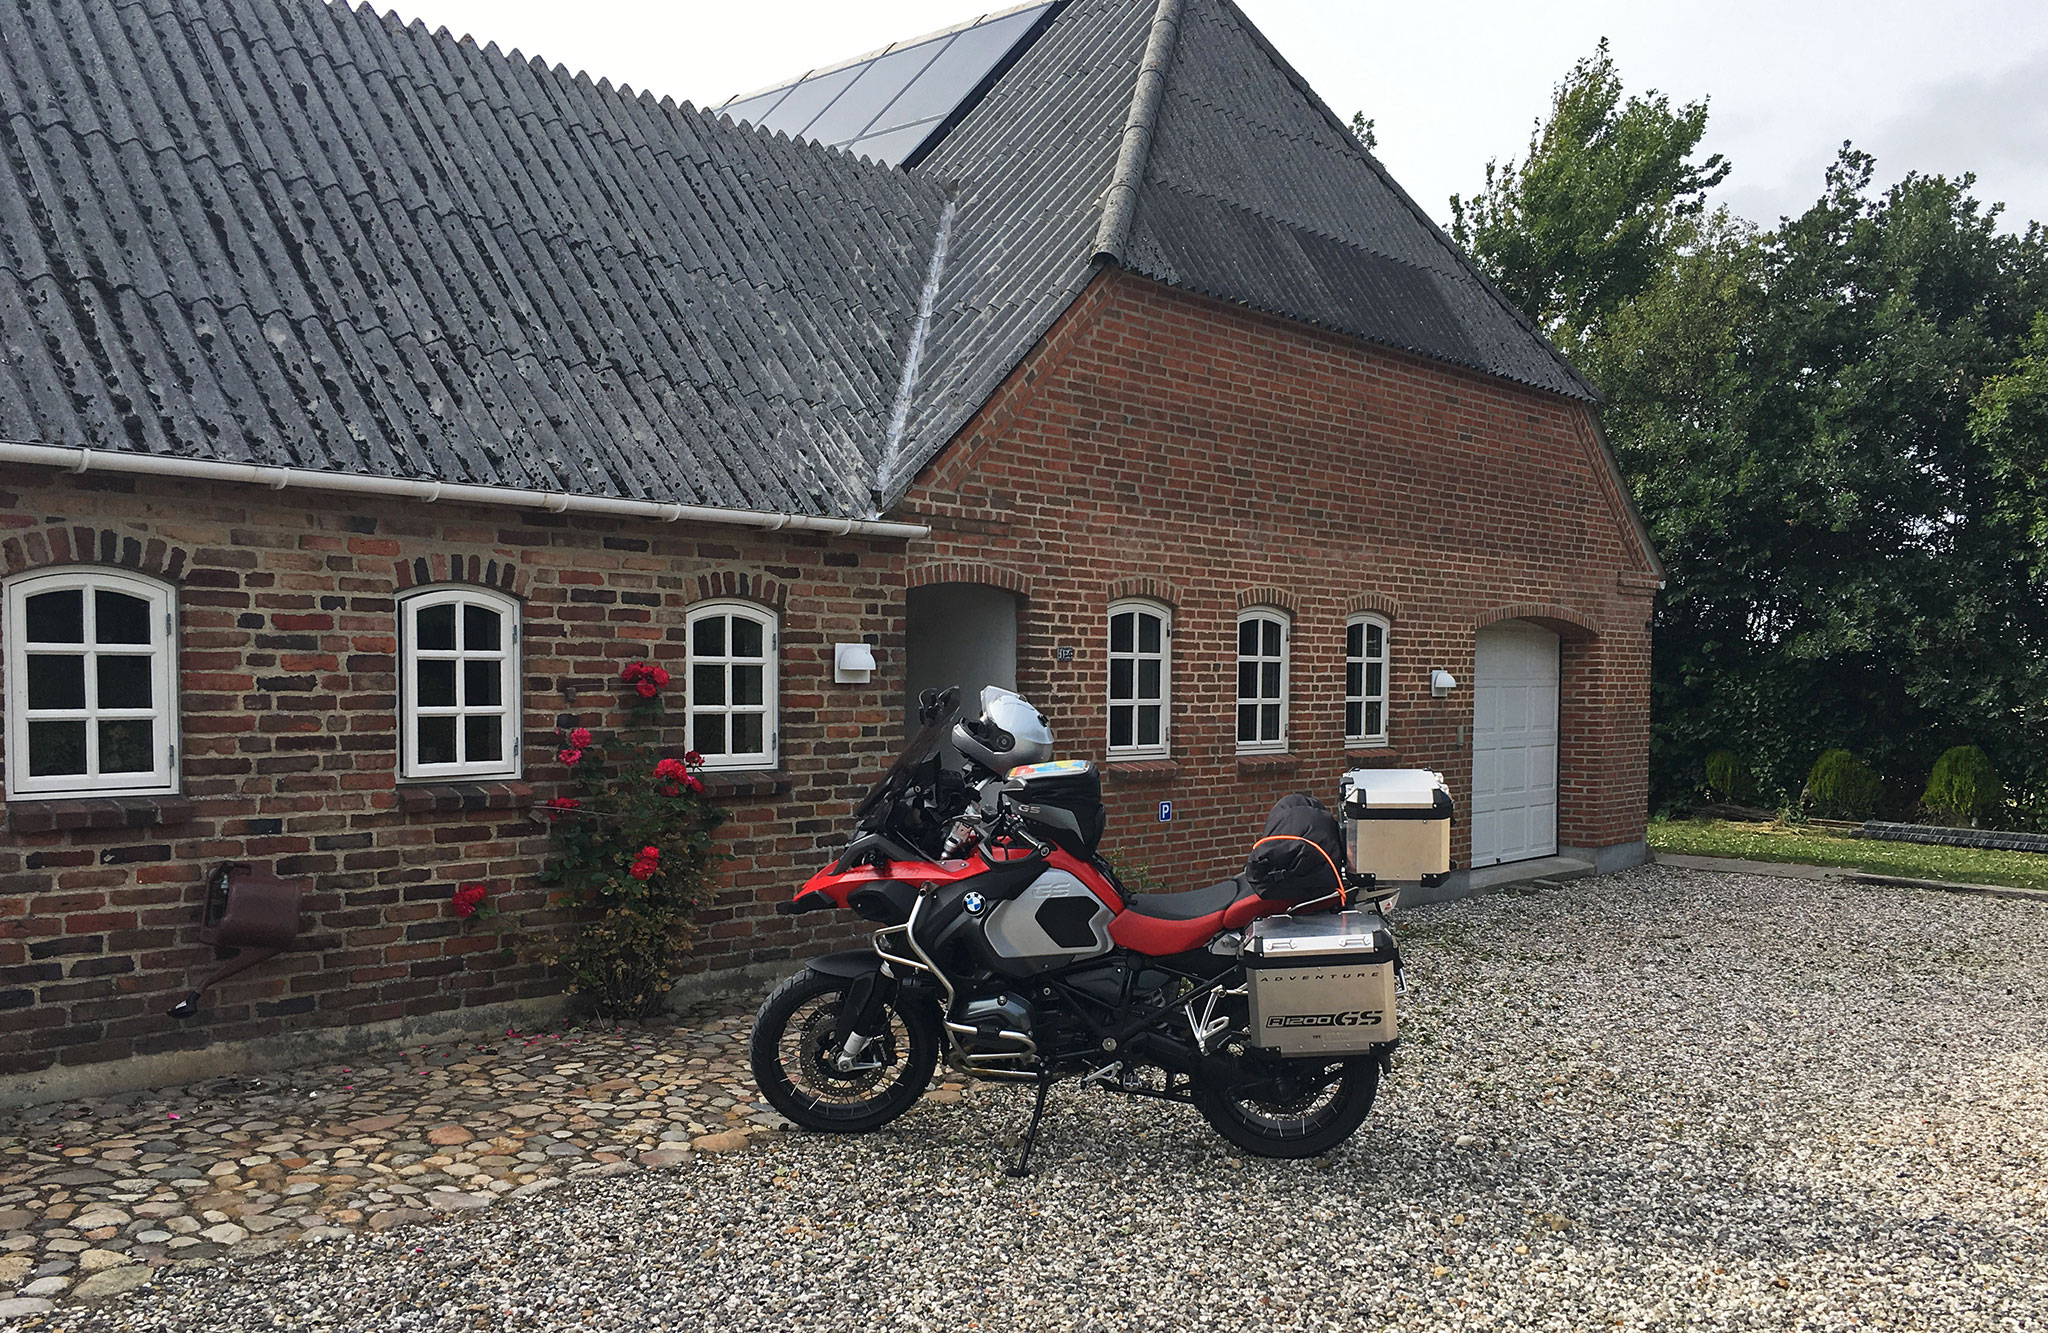 In Denmark, Holmsland B&B